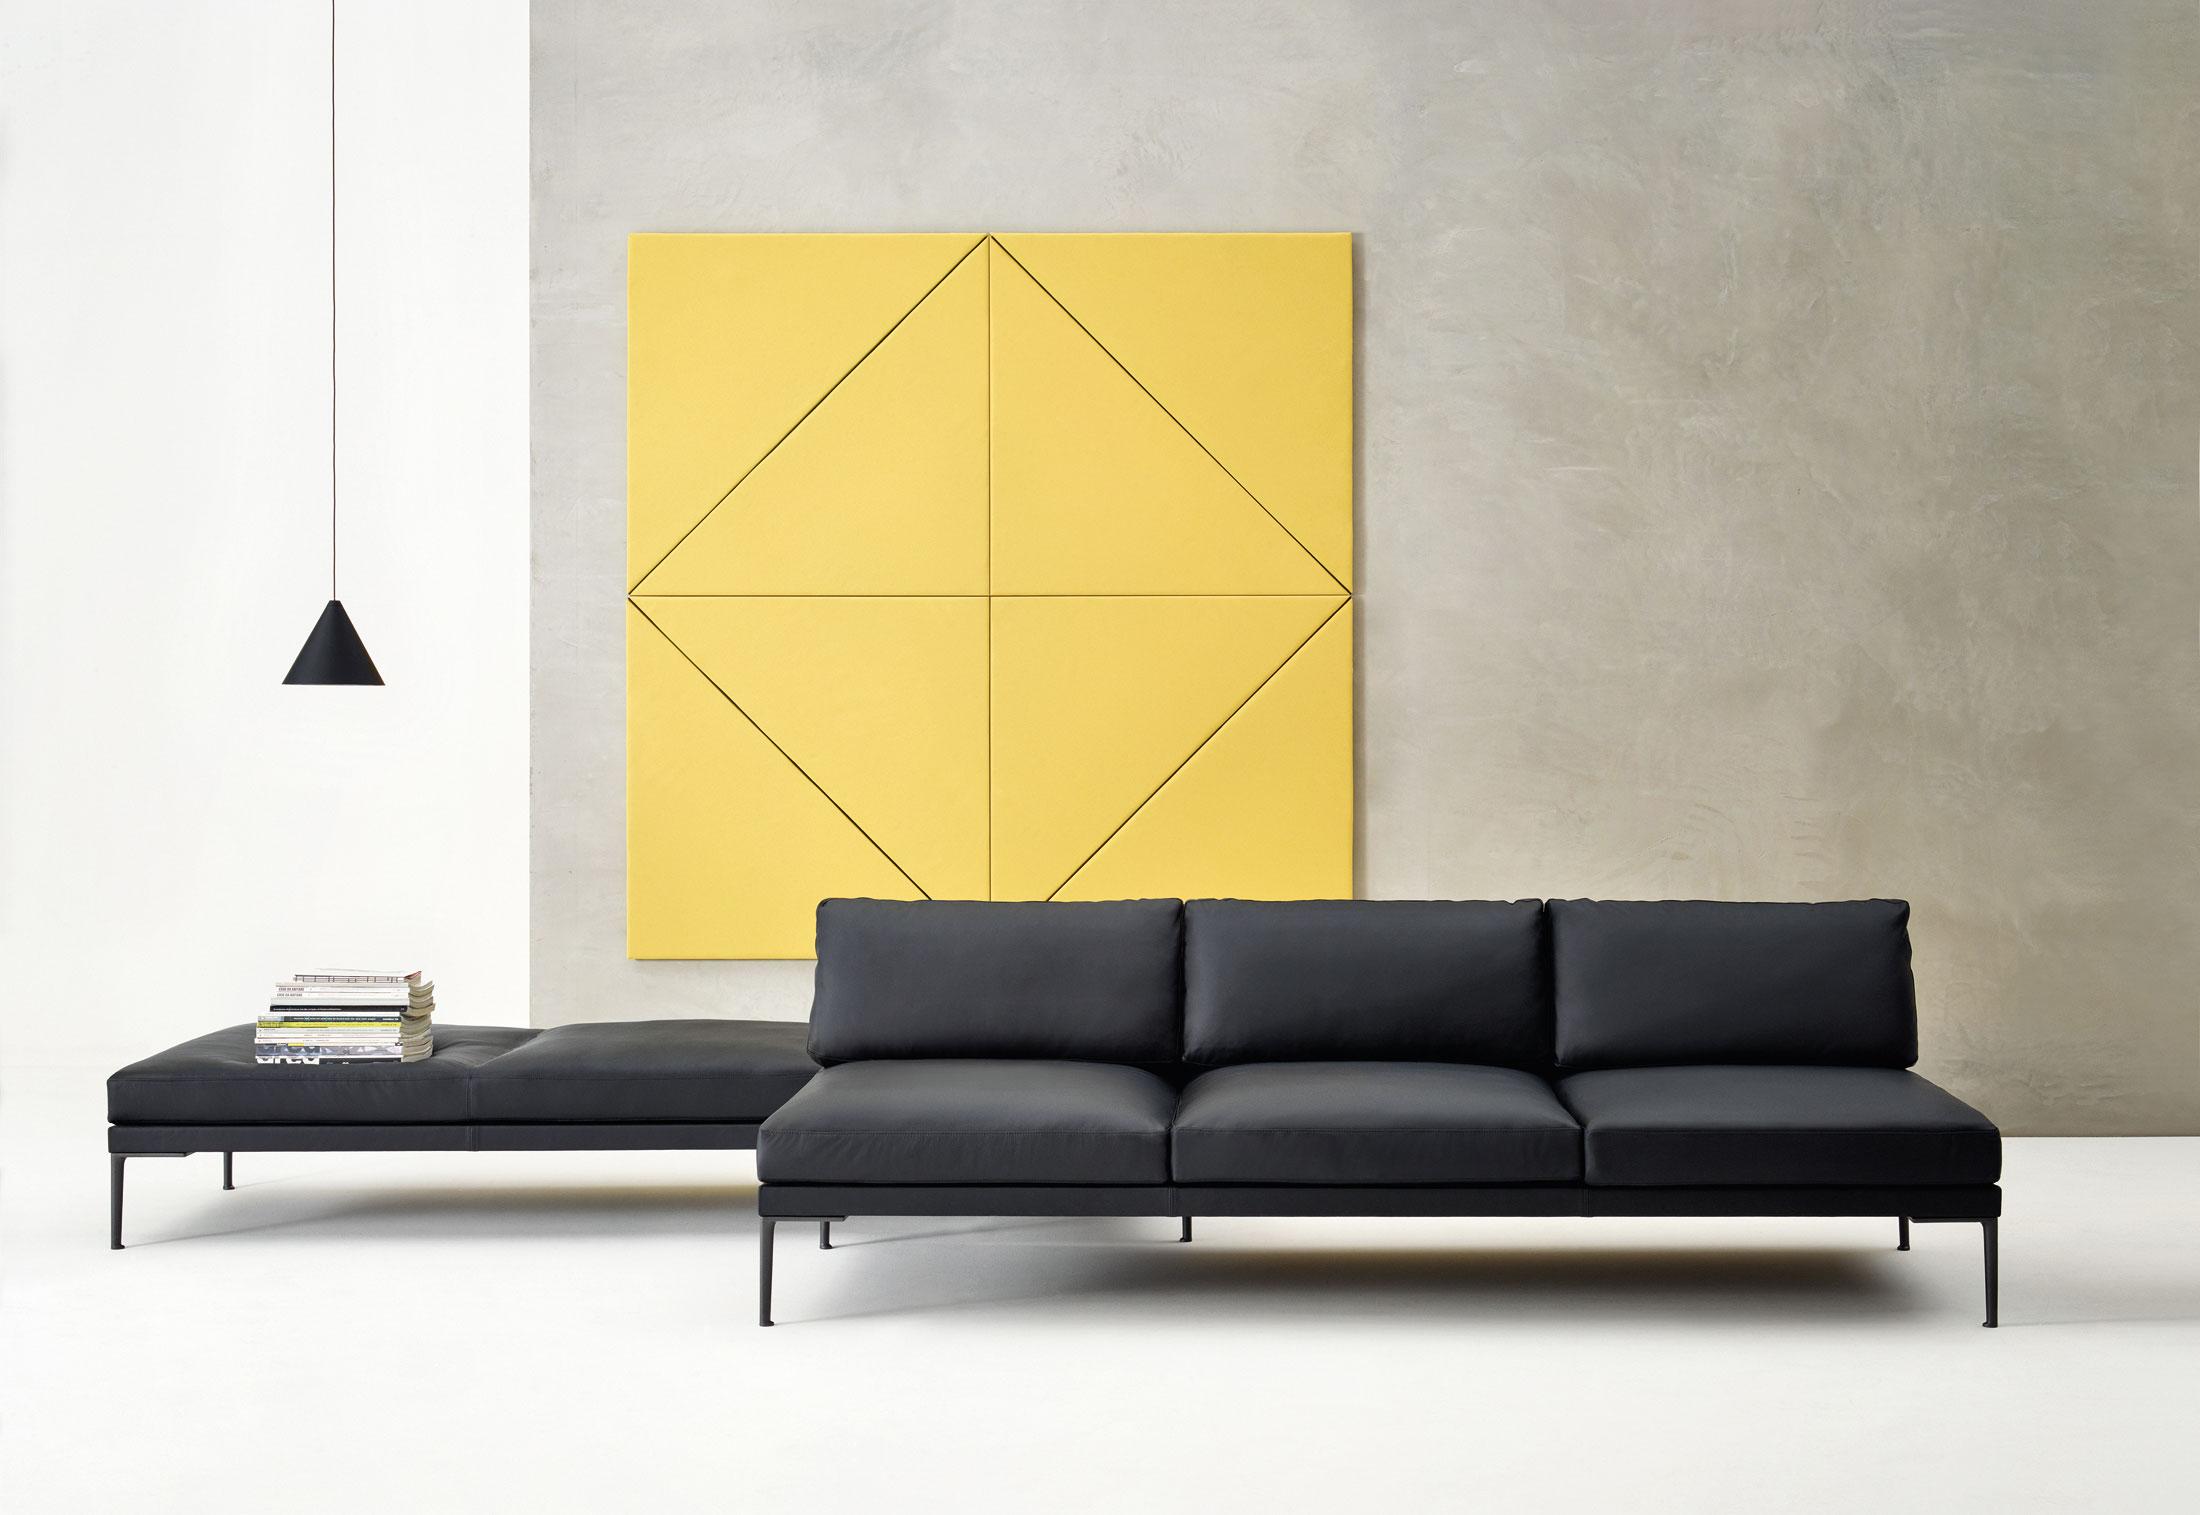 Steeve modular furniture